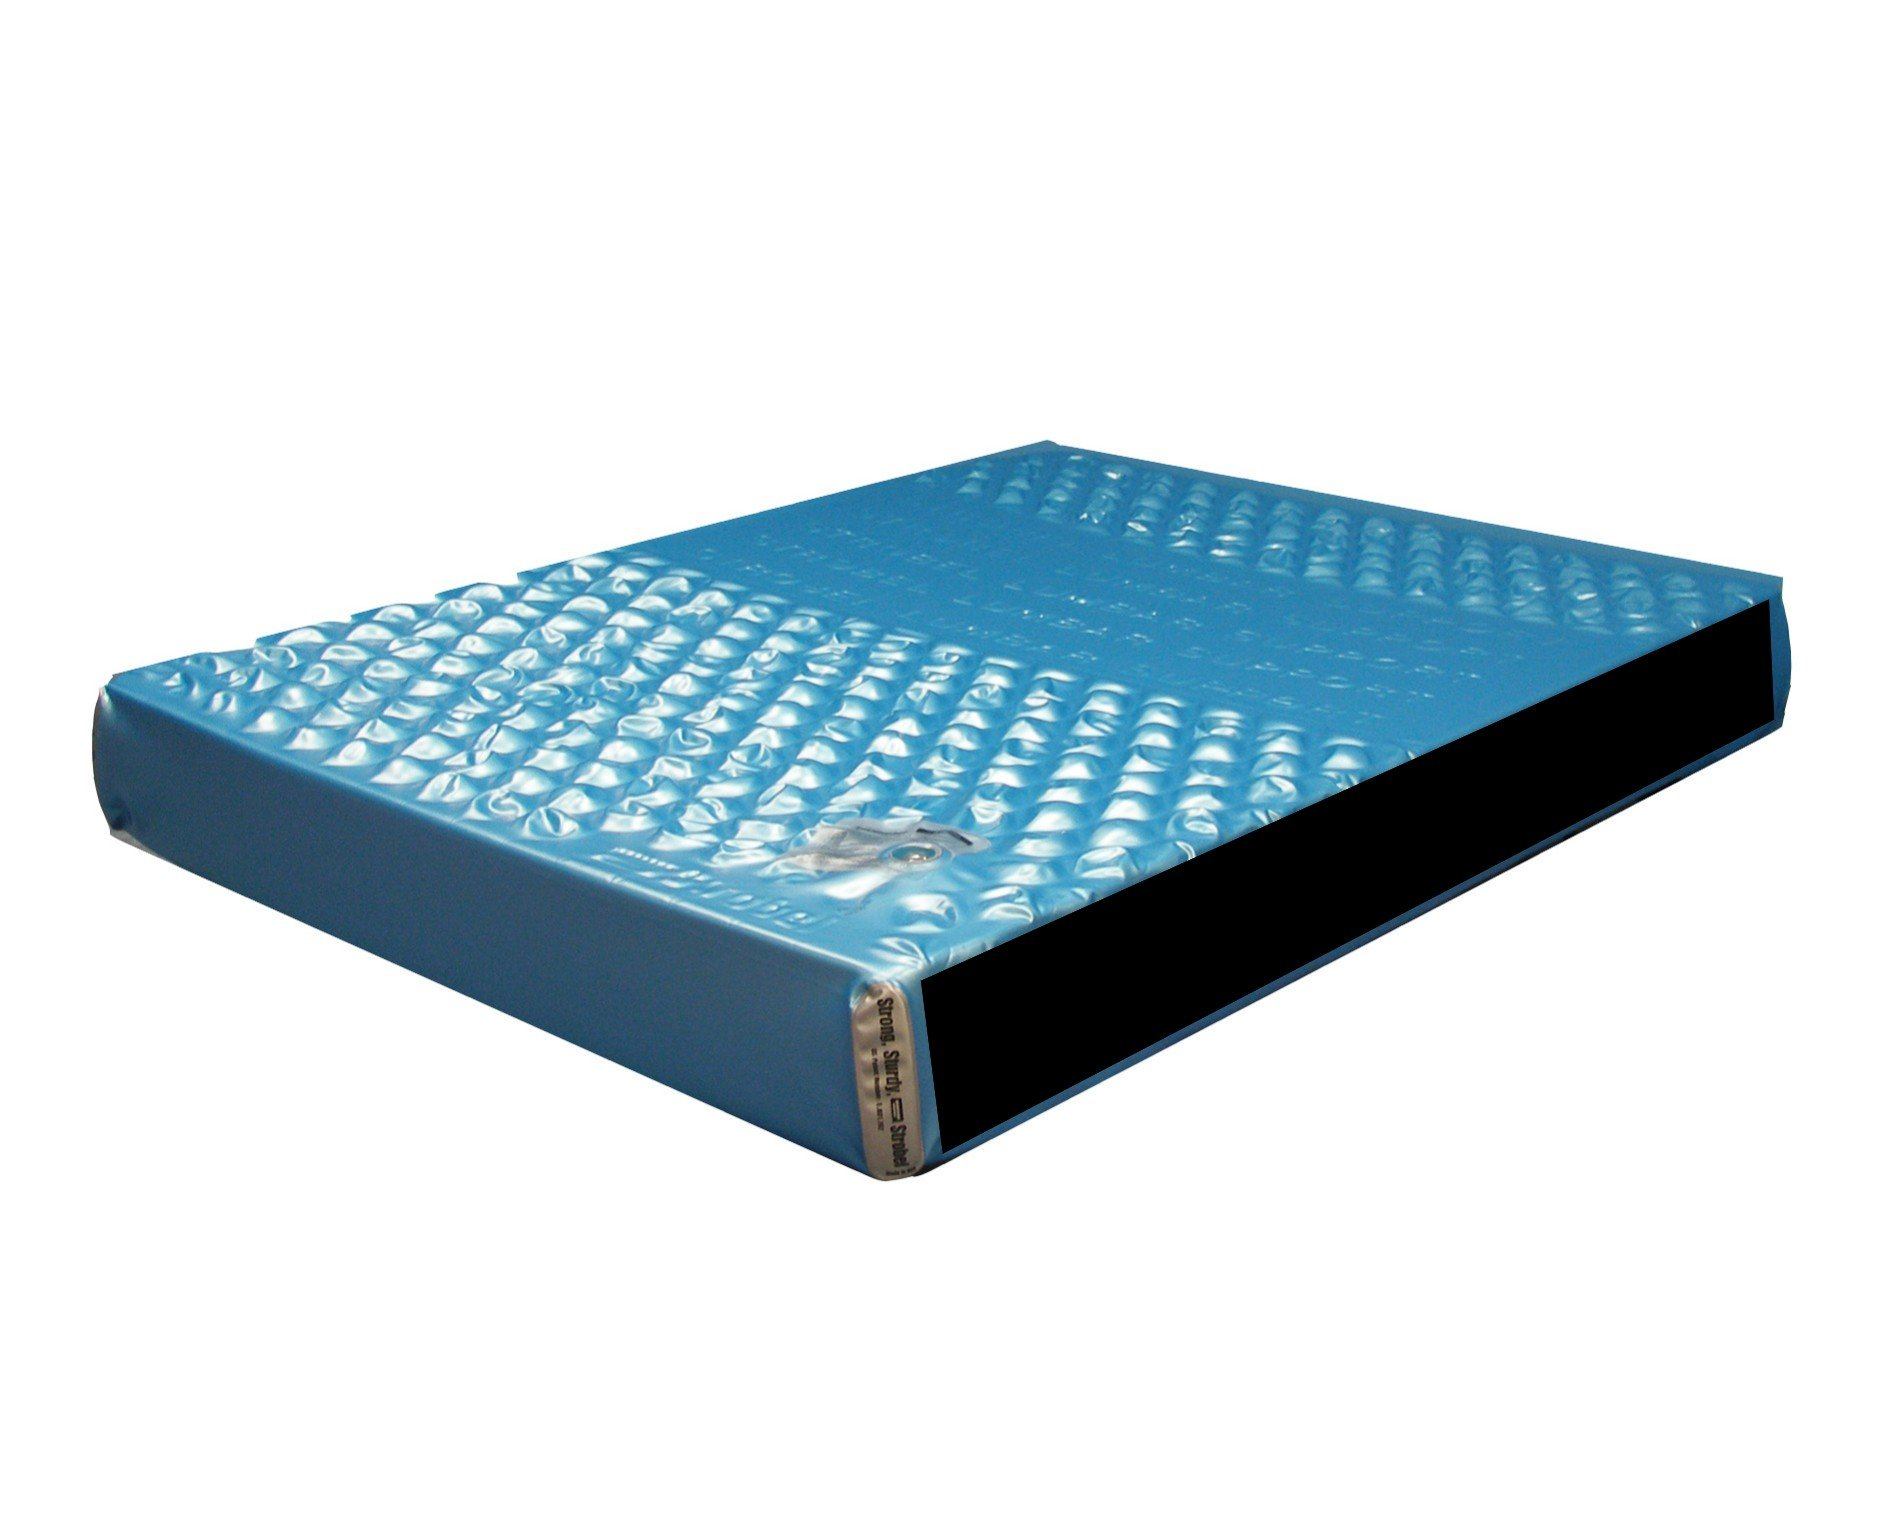 Strobel Organic Waterbed Mattress Hydro Support 1 King